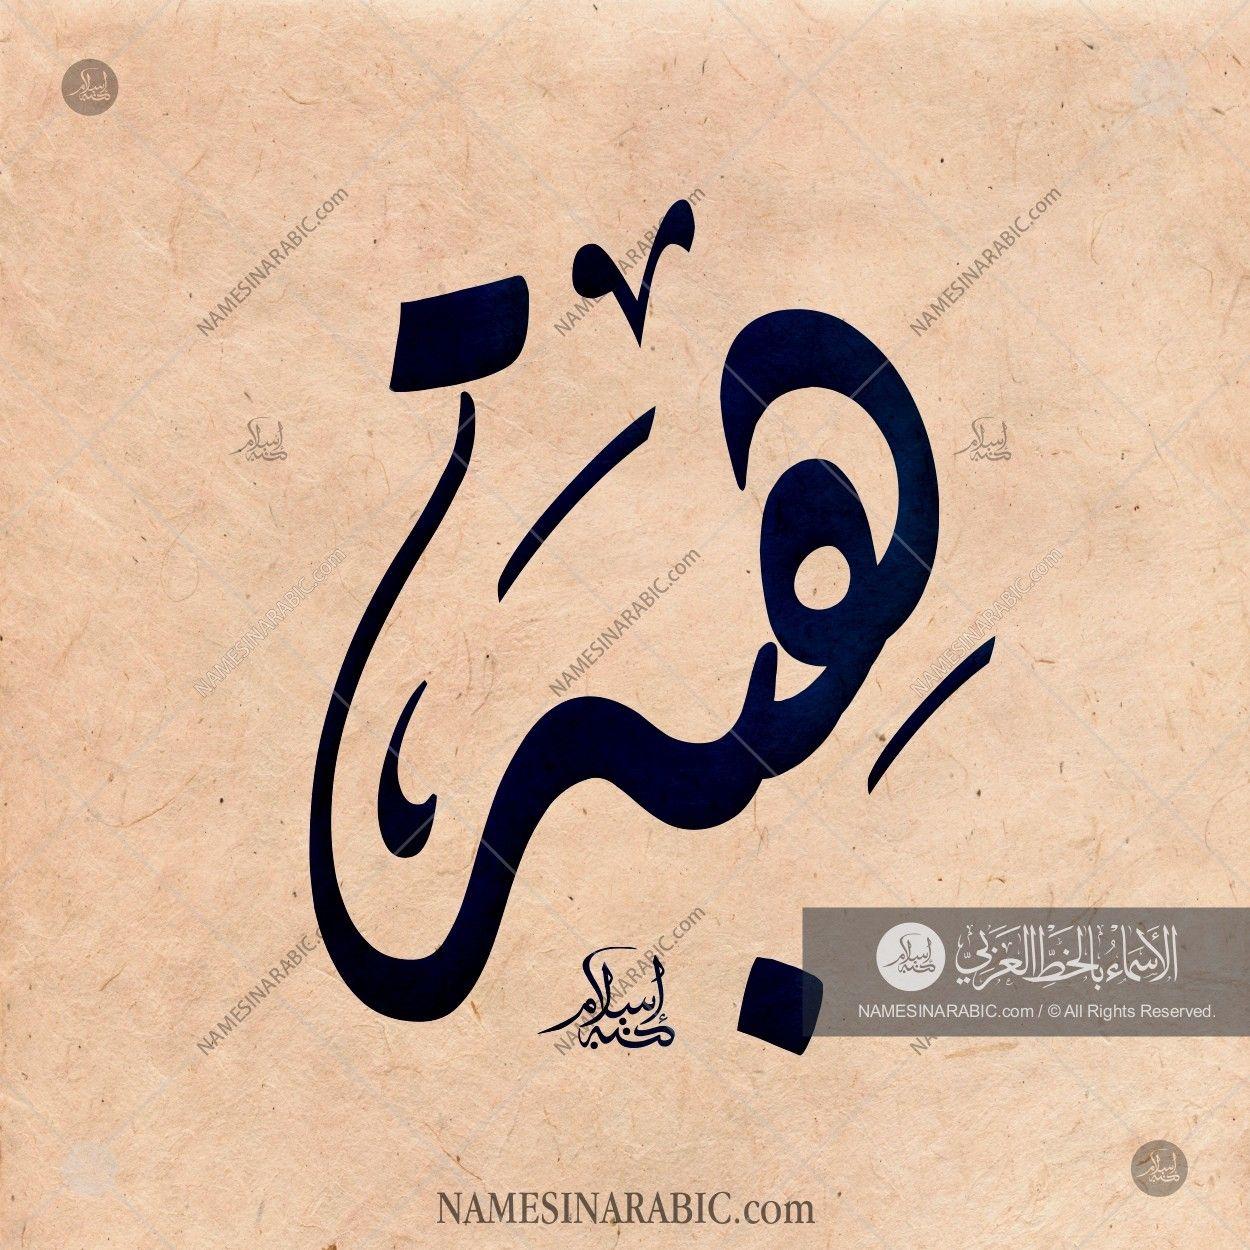 Hibba هبة Names In Arabic Calligraphy Name 1559 Calligraphy Name Calligraphy Words Arabic Calligraphy Design